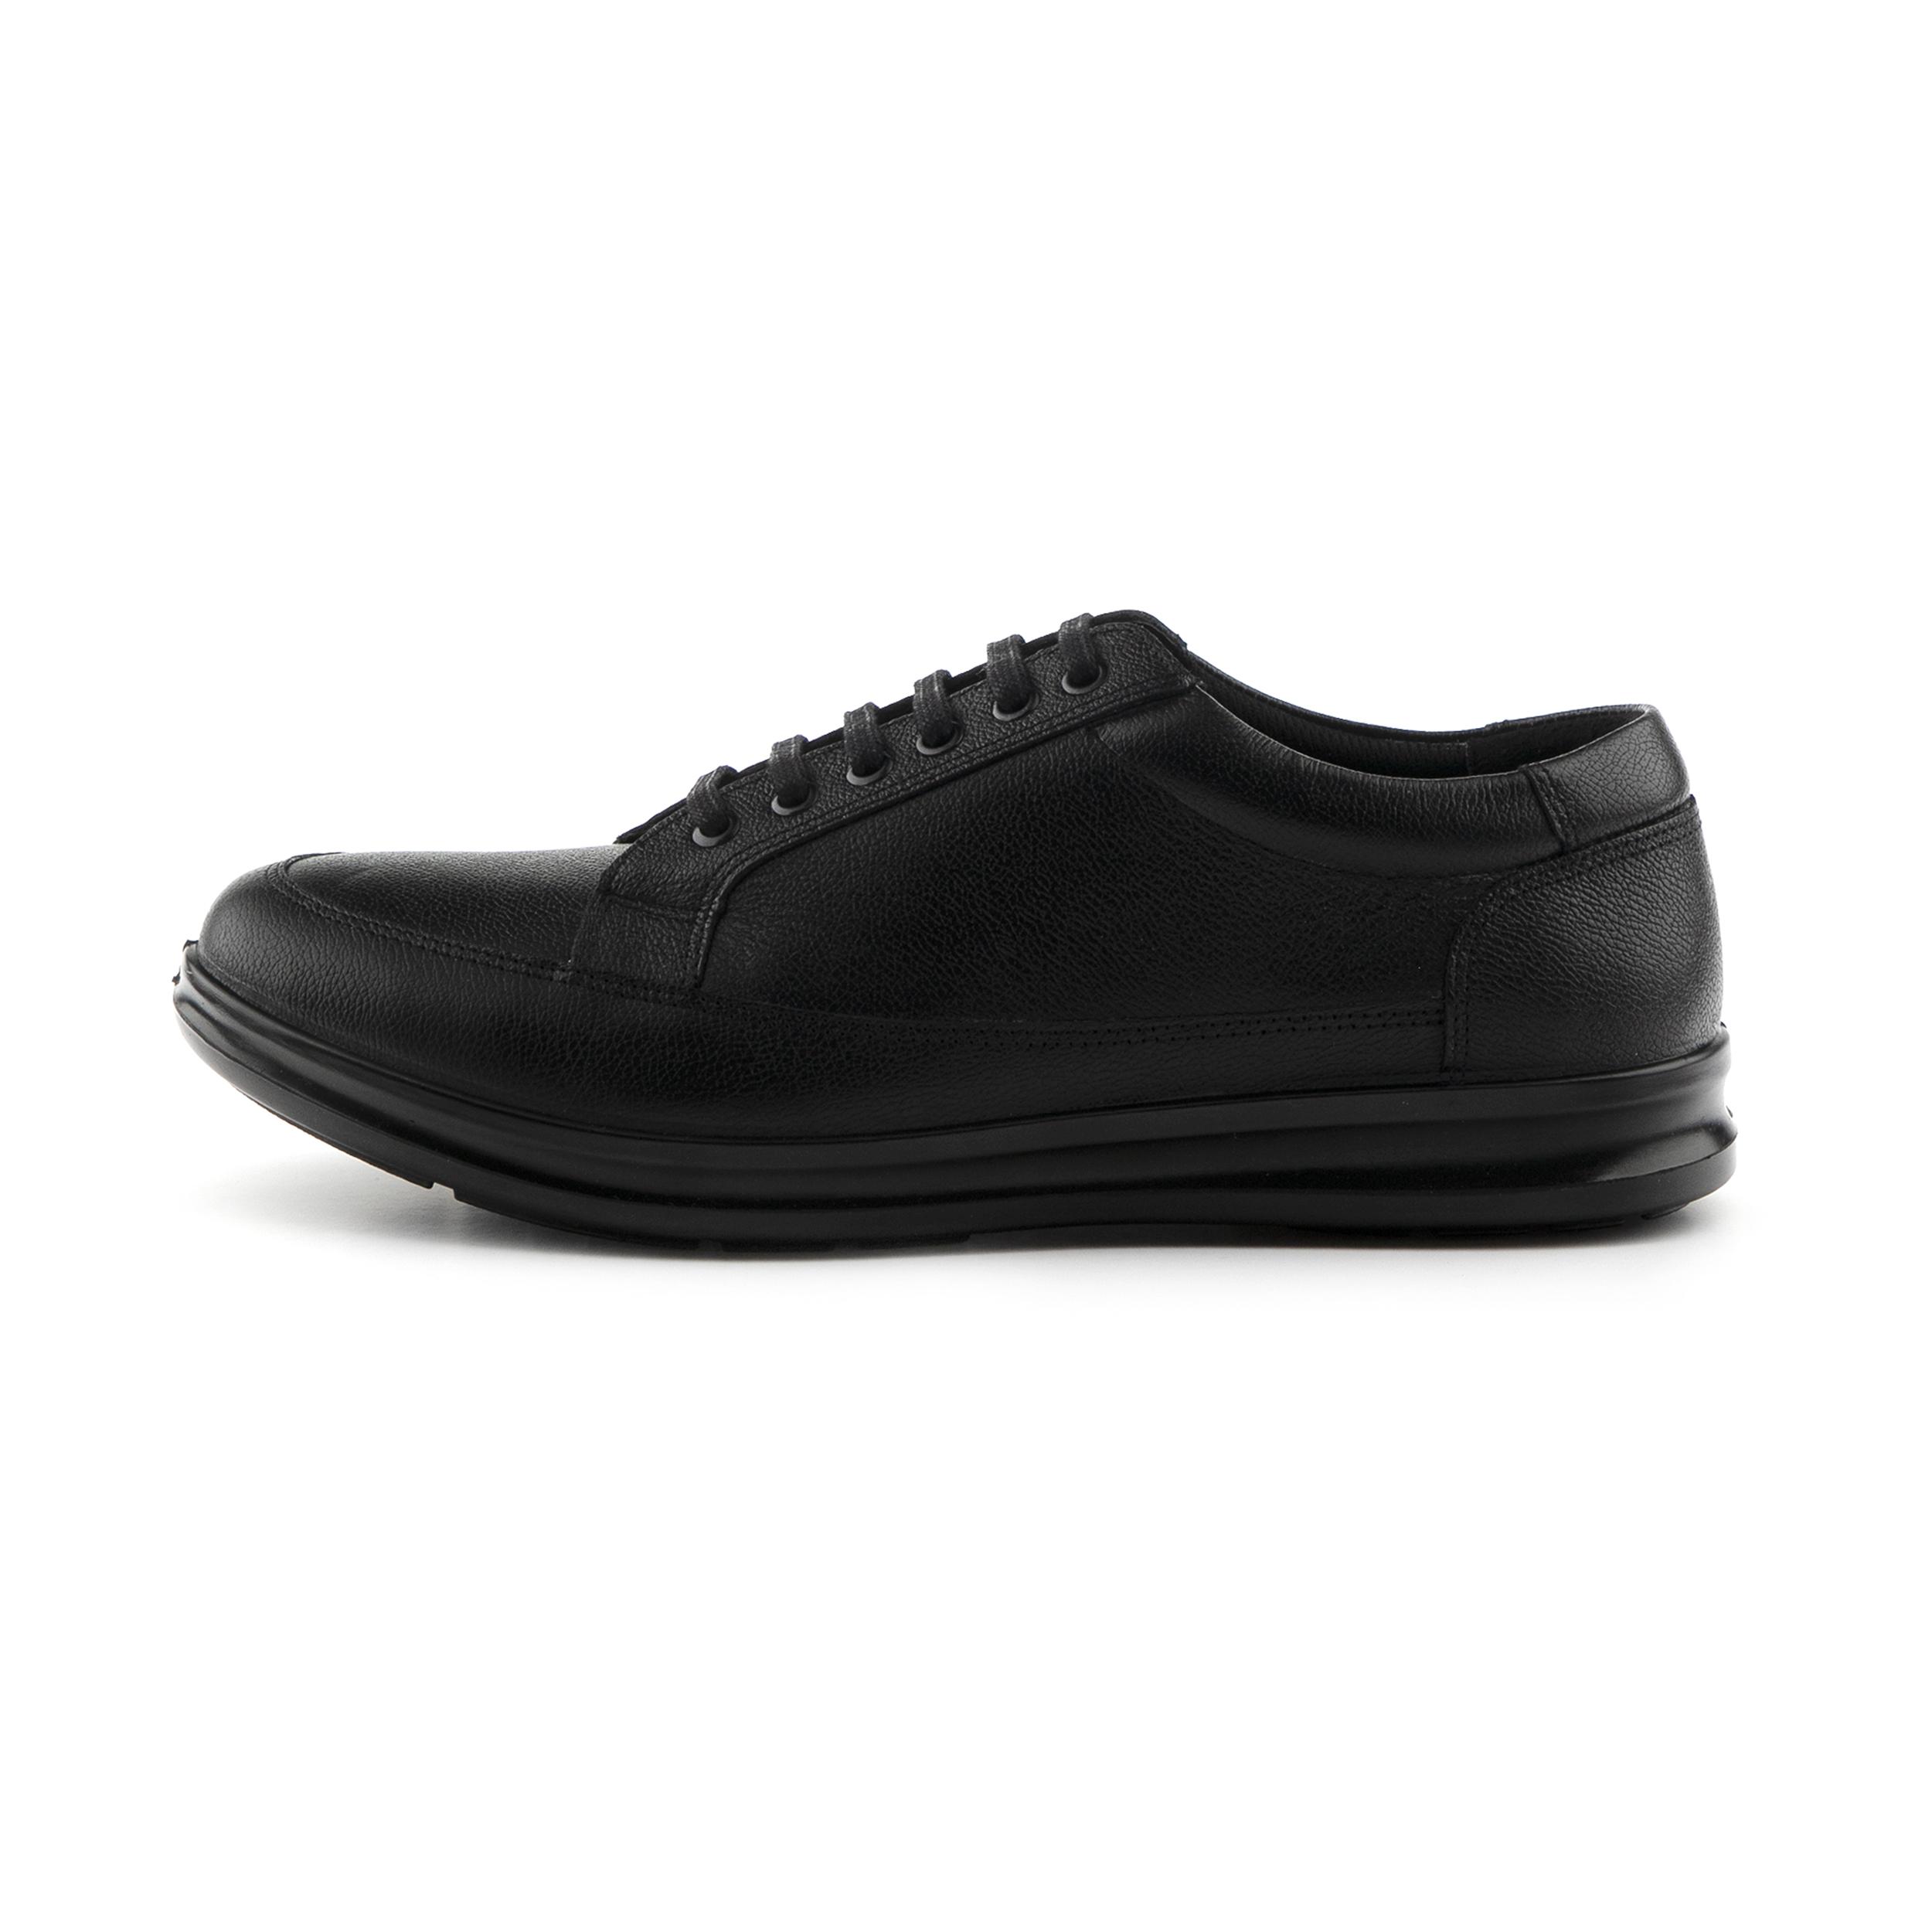 کفش روزمره مردانه دنیلی مدل Artman-213070291003